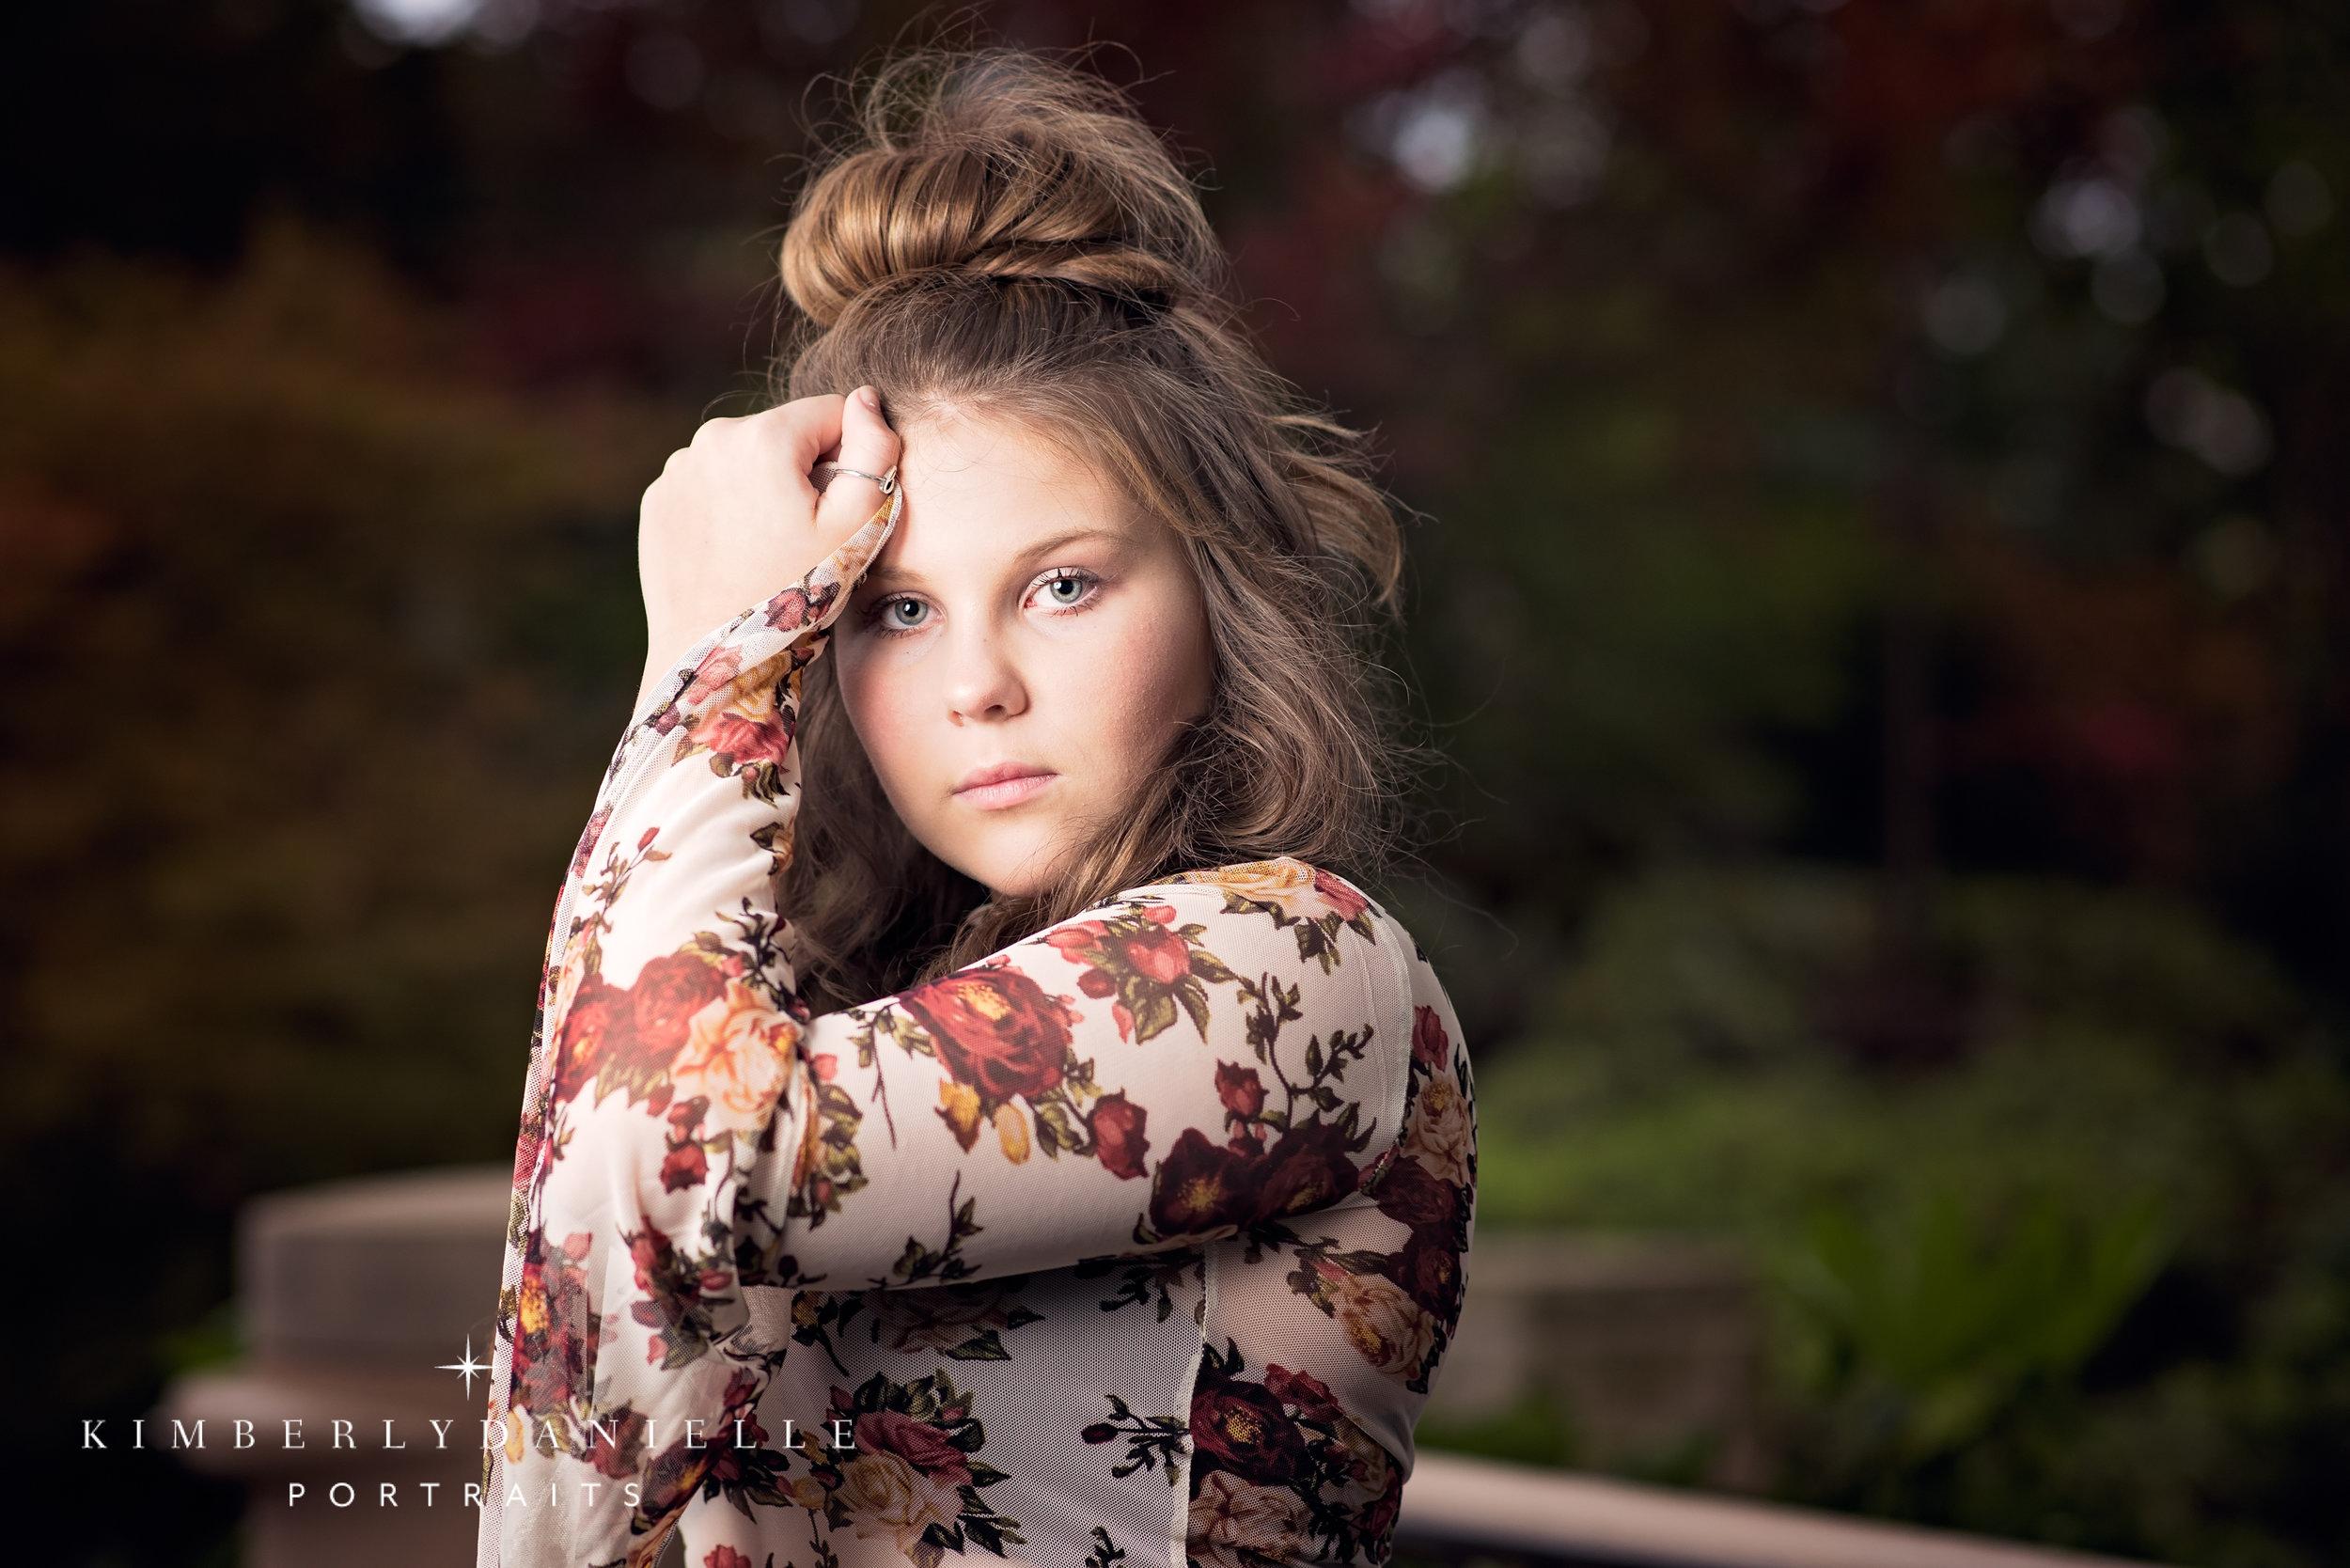 kimberly-danielle-portraits-tween-bella-056.jpg